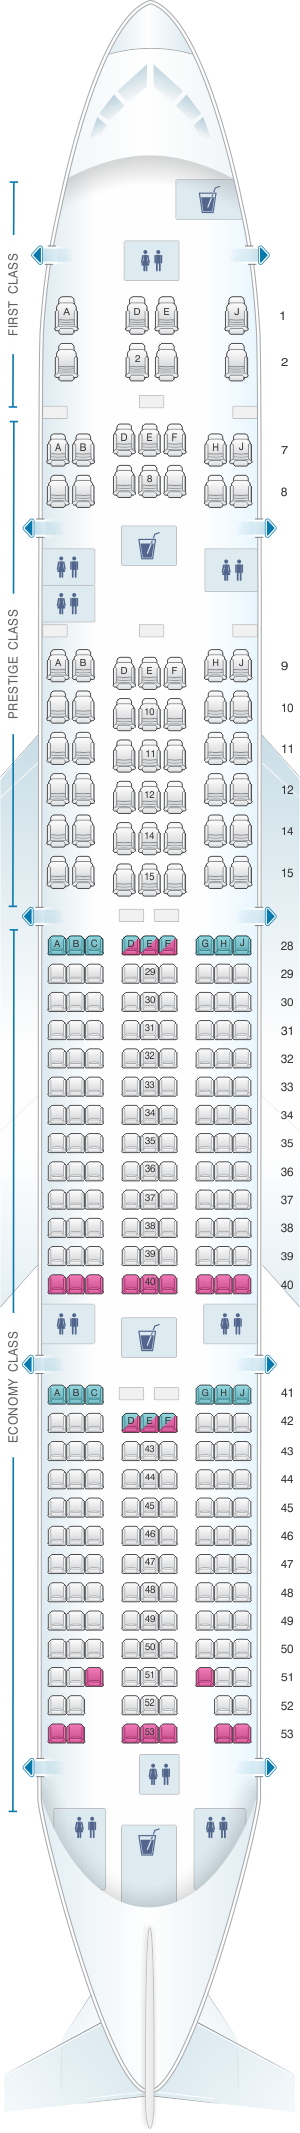 Seat map for Korean Air Boeing B777 300ER 291PAX